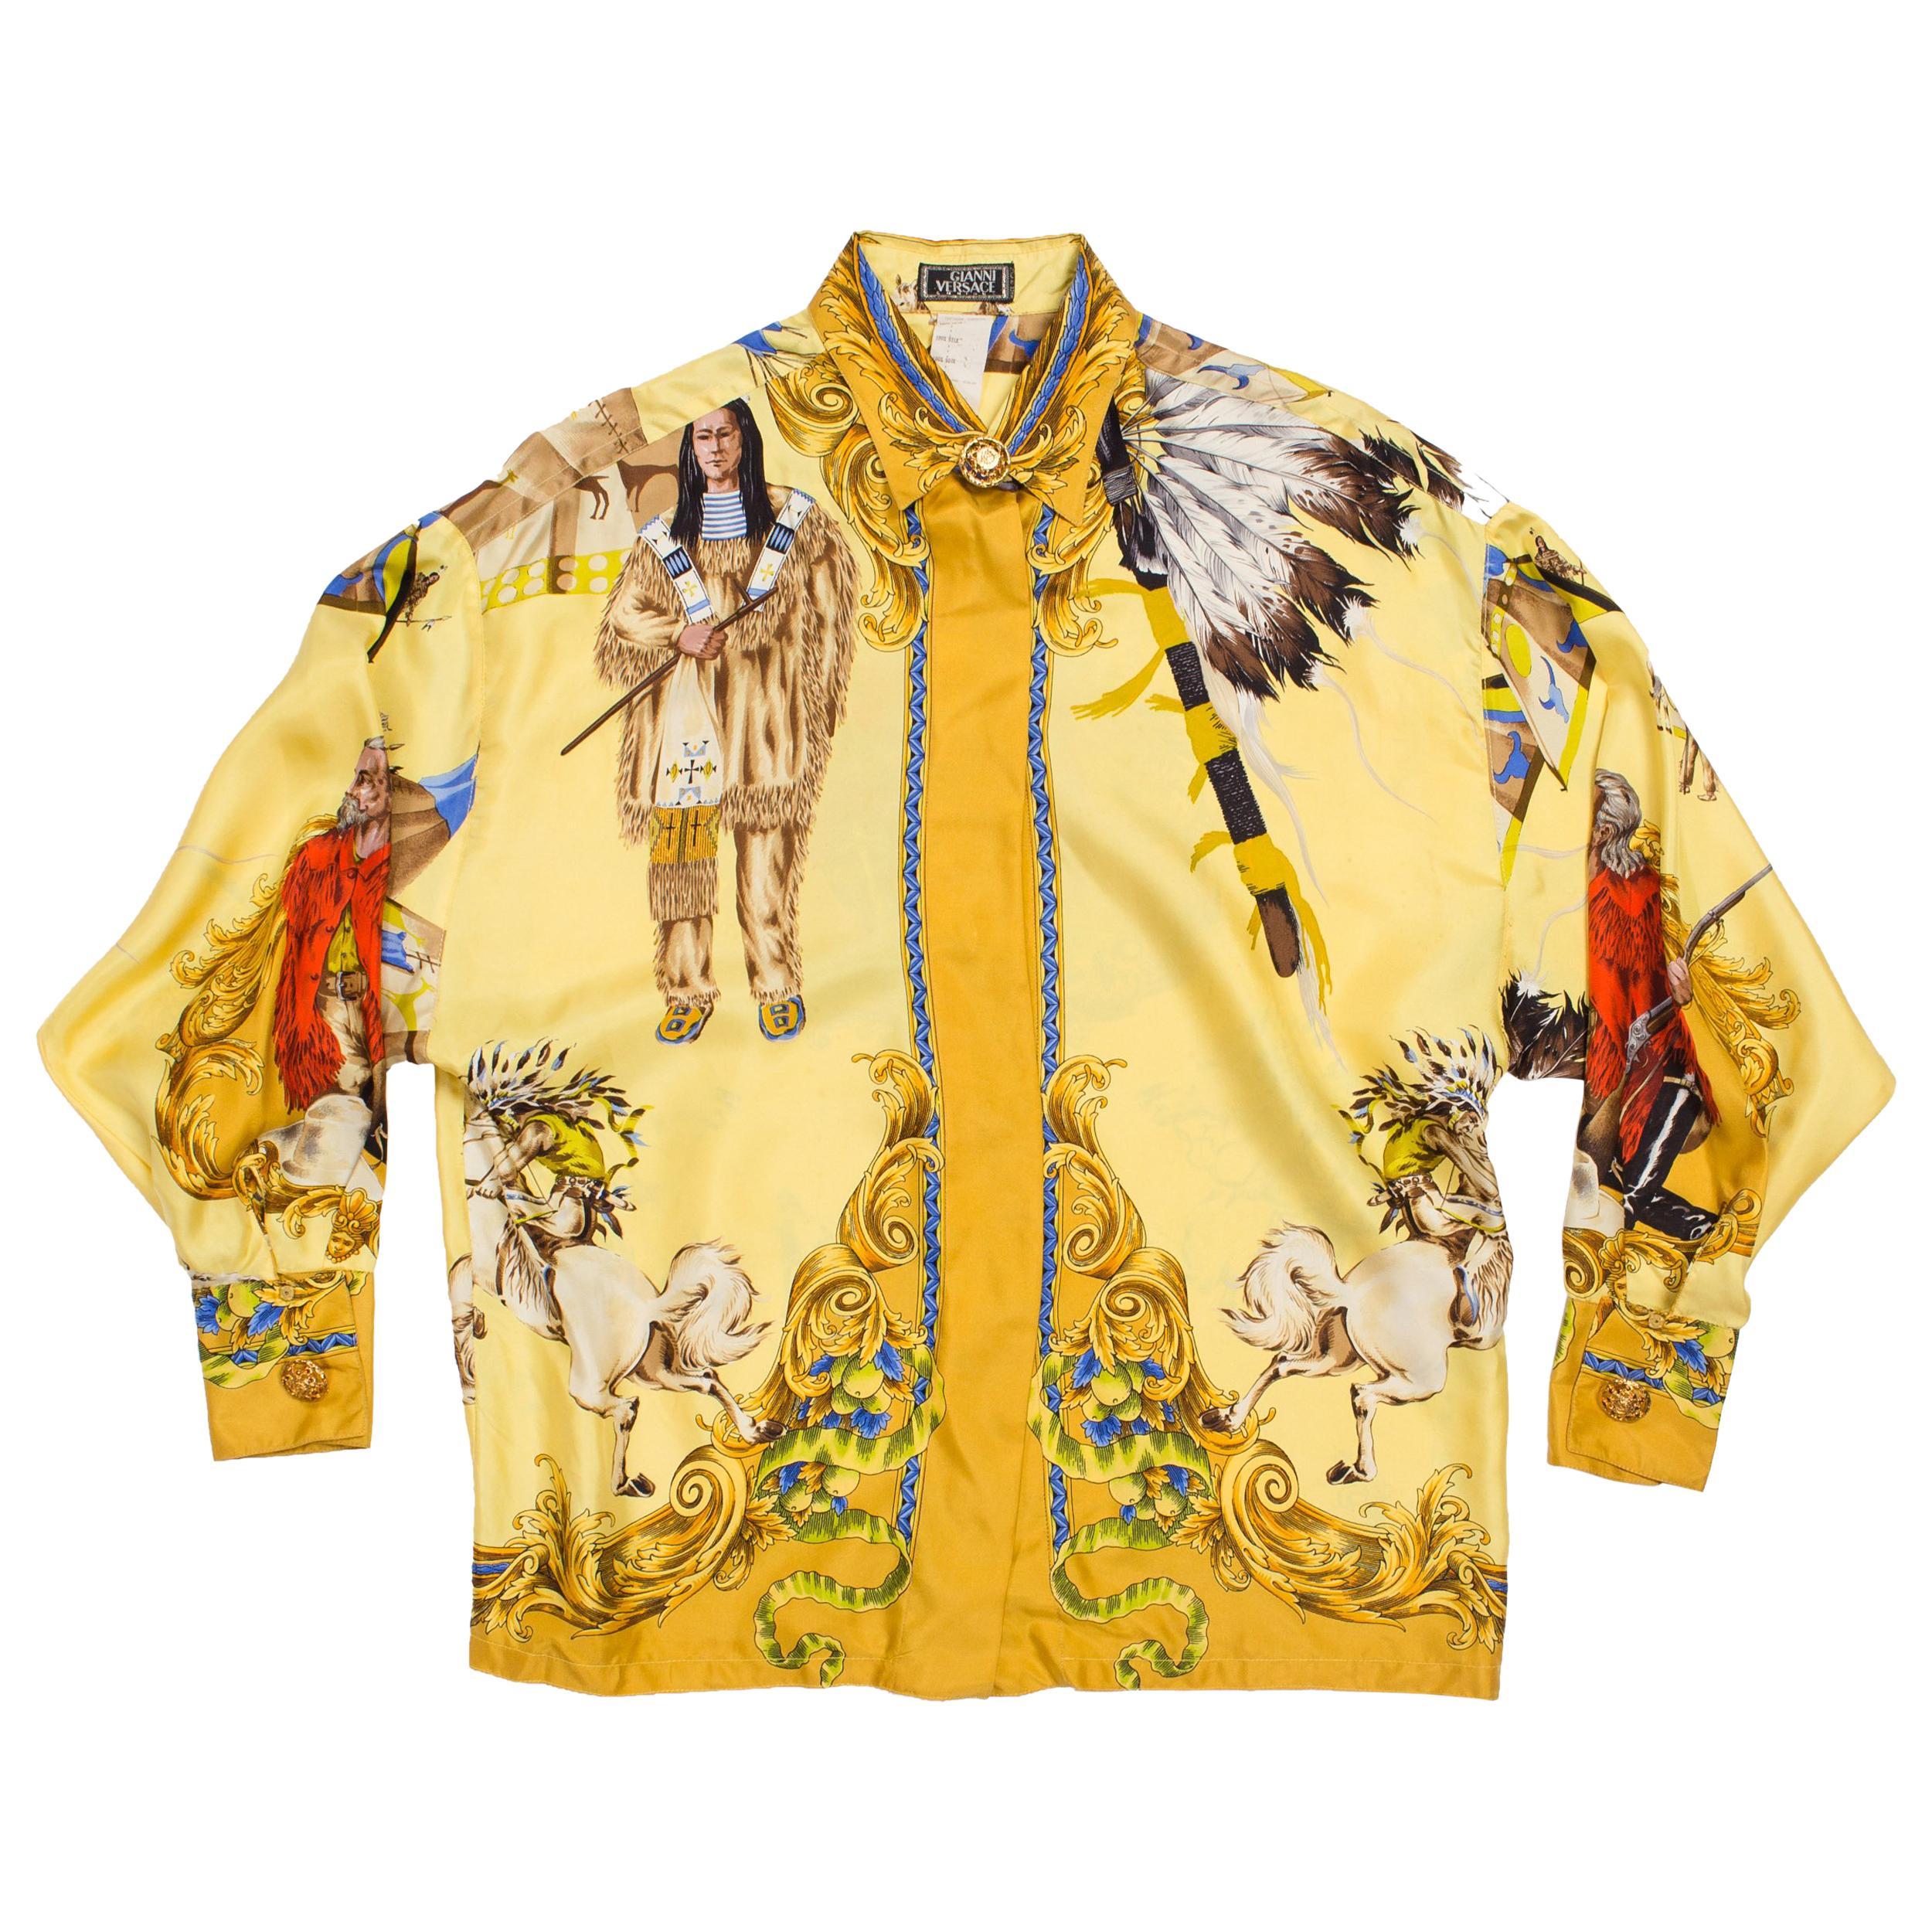 1990S GIANNI VERSACE Pale Yellow Silk Buffalo Bill Native American Print Shirt